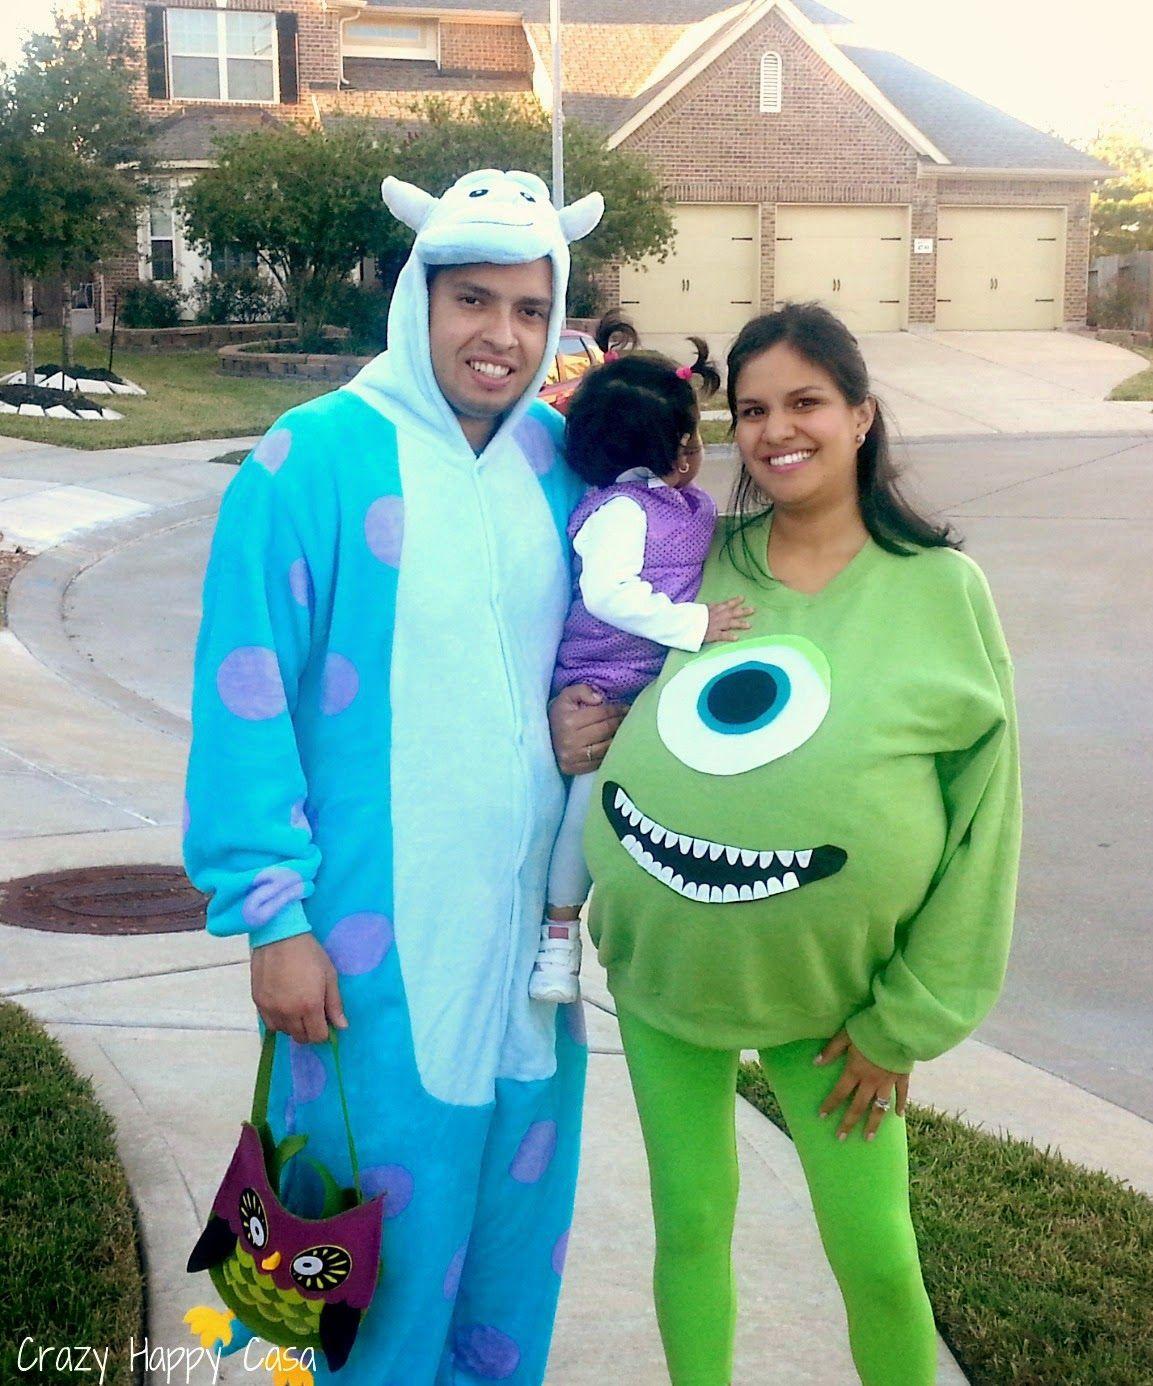 DIY Monsters Inc Costume  Crazy Happy Casa Halloween Recap Monsters Inc DIY Family